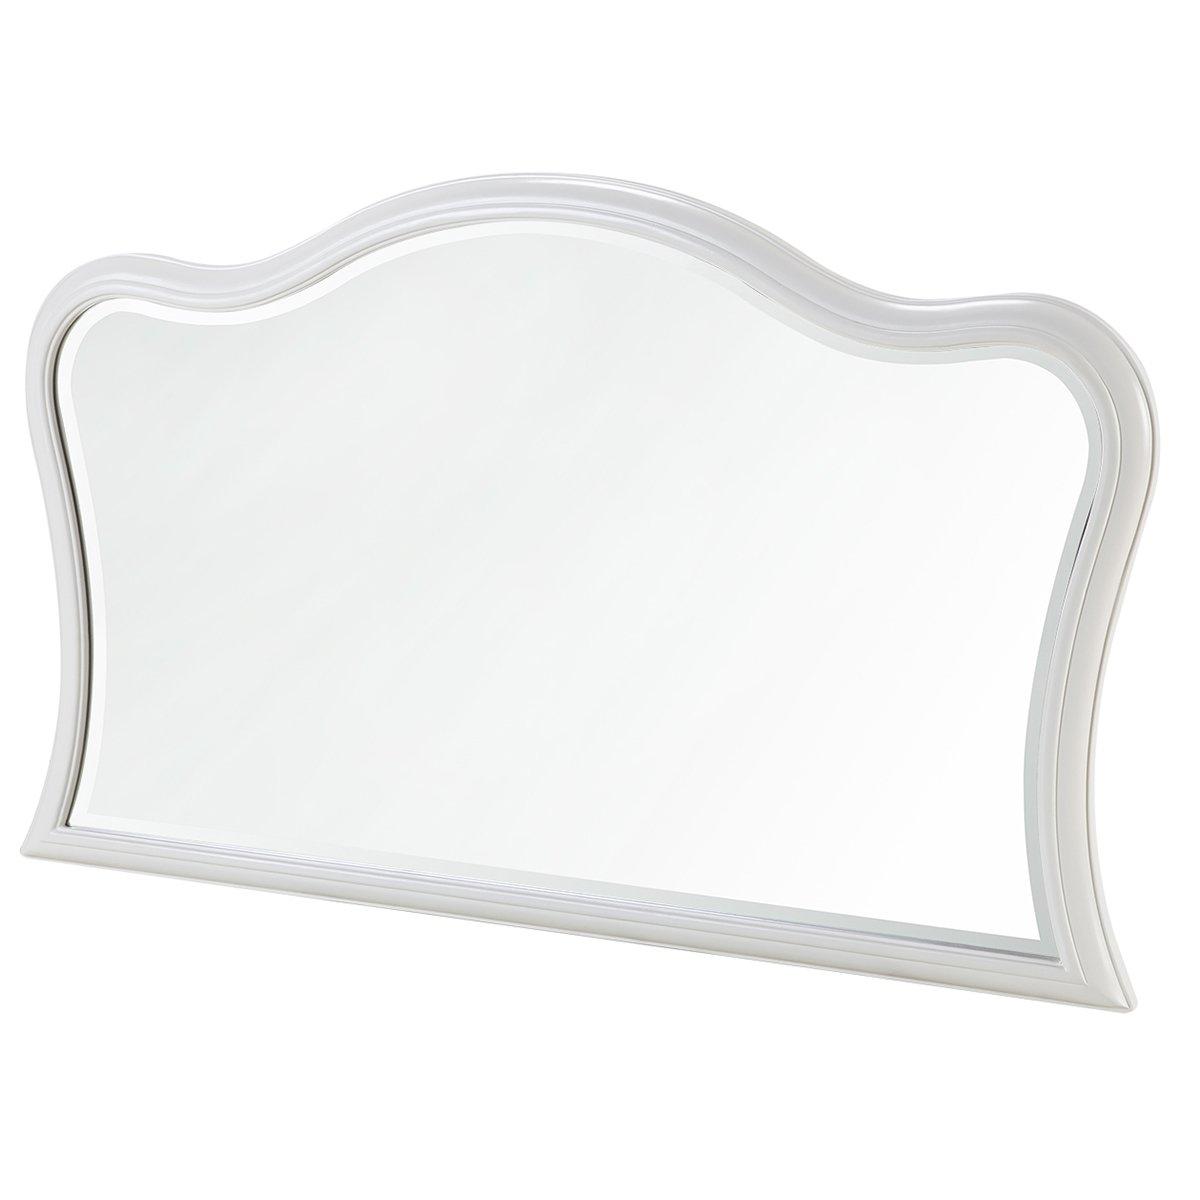 Зеркало к буфету Kurcir Carpenter 309-1 403120